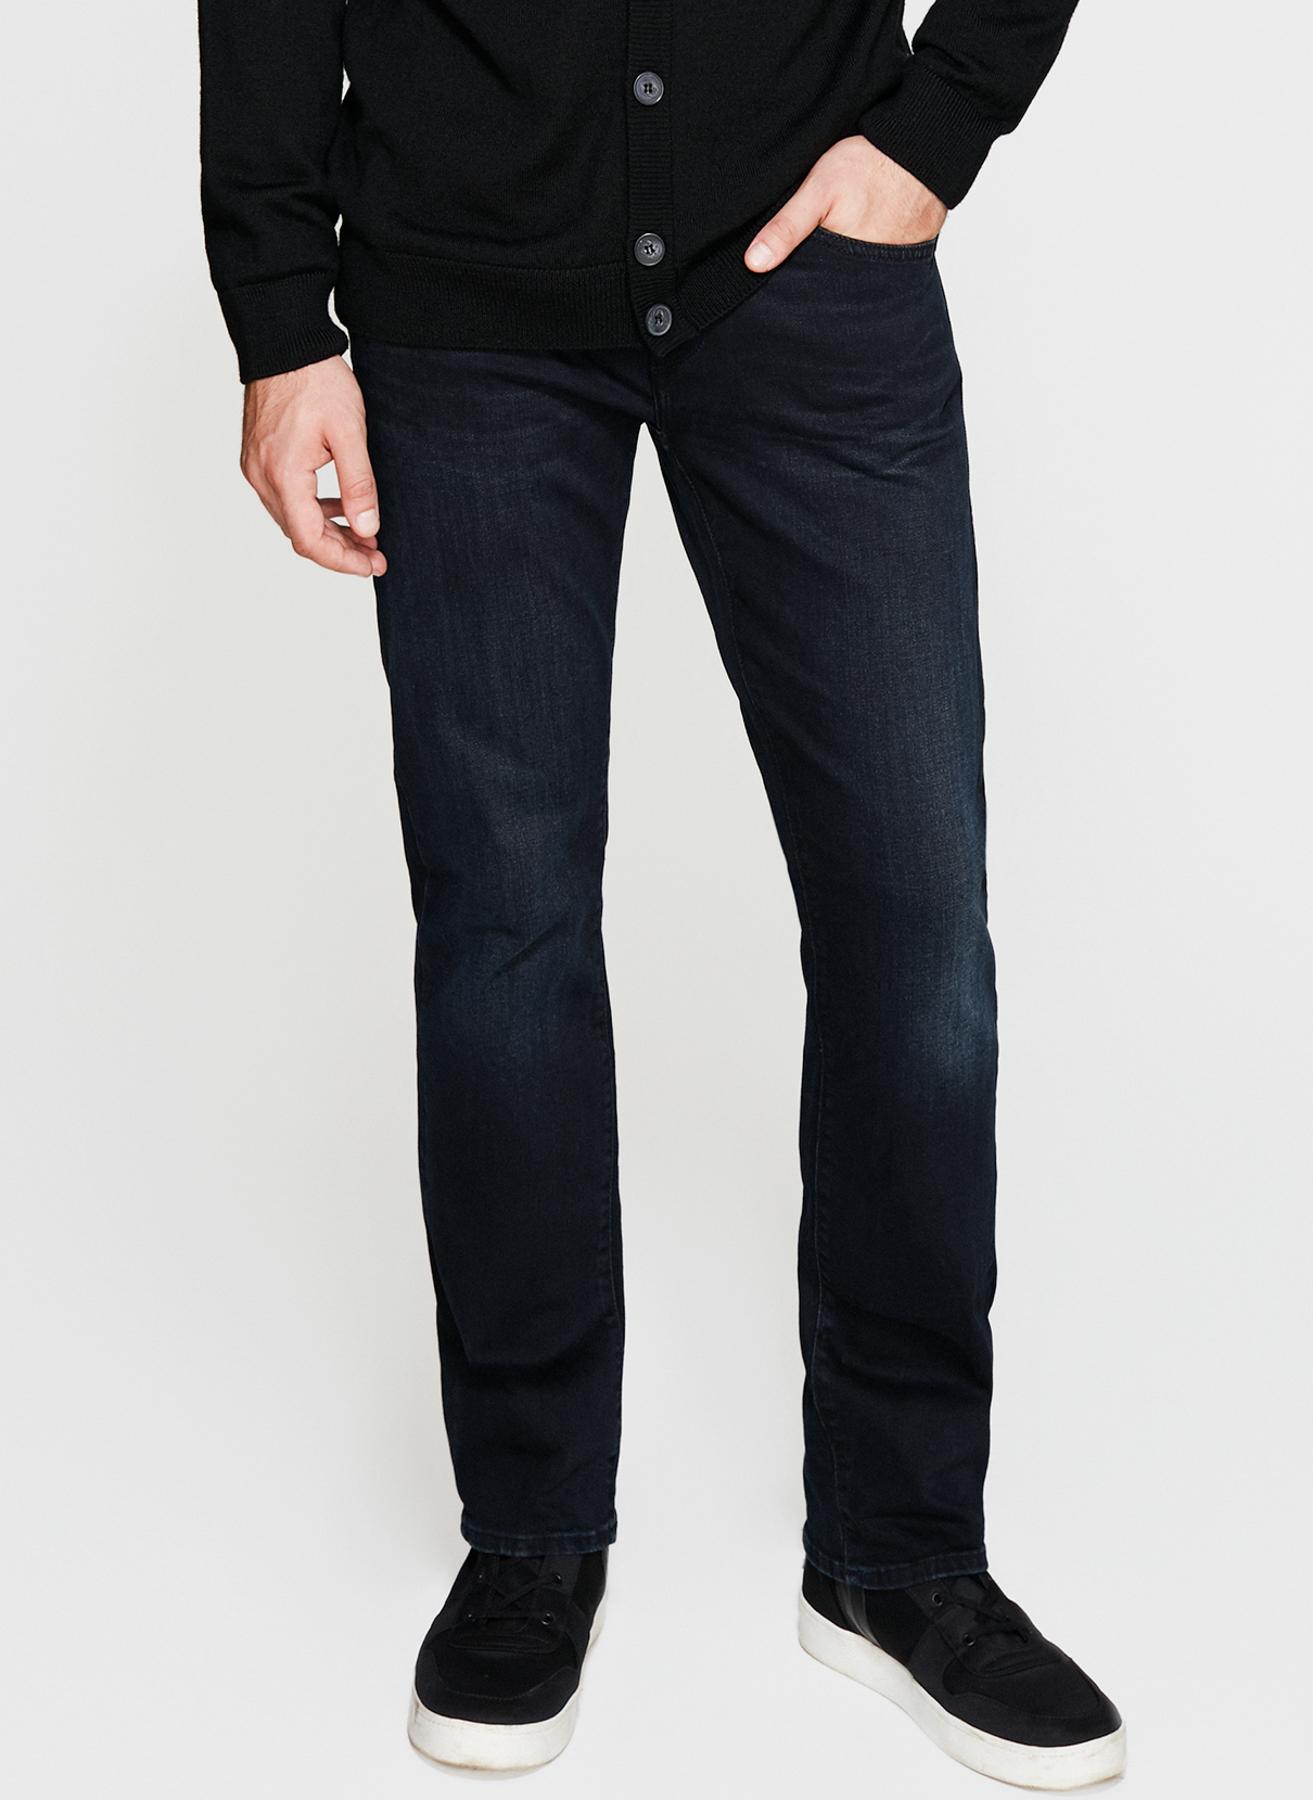 Mavi Klasik Pantolon 30-30 5001822924024 Ürün Resmi